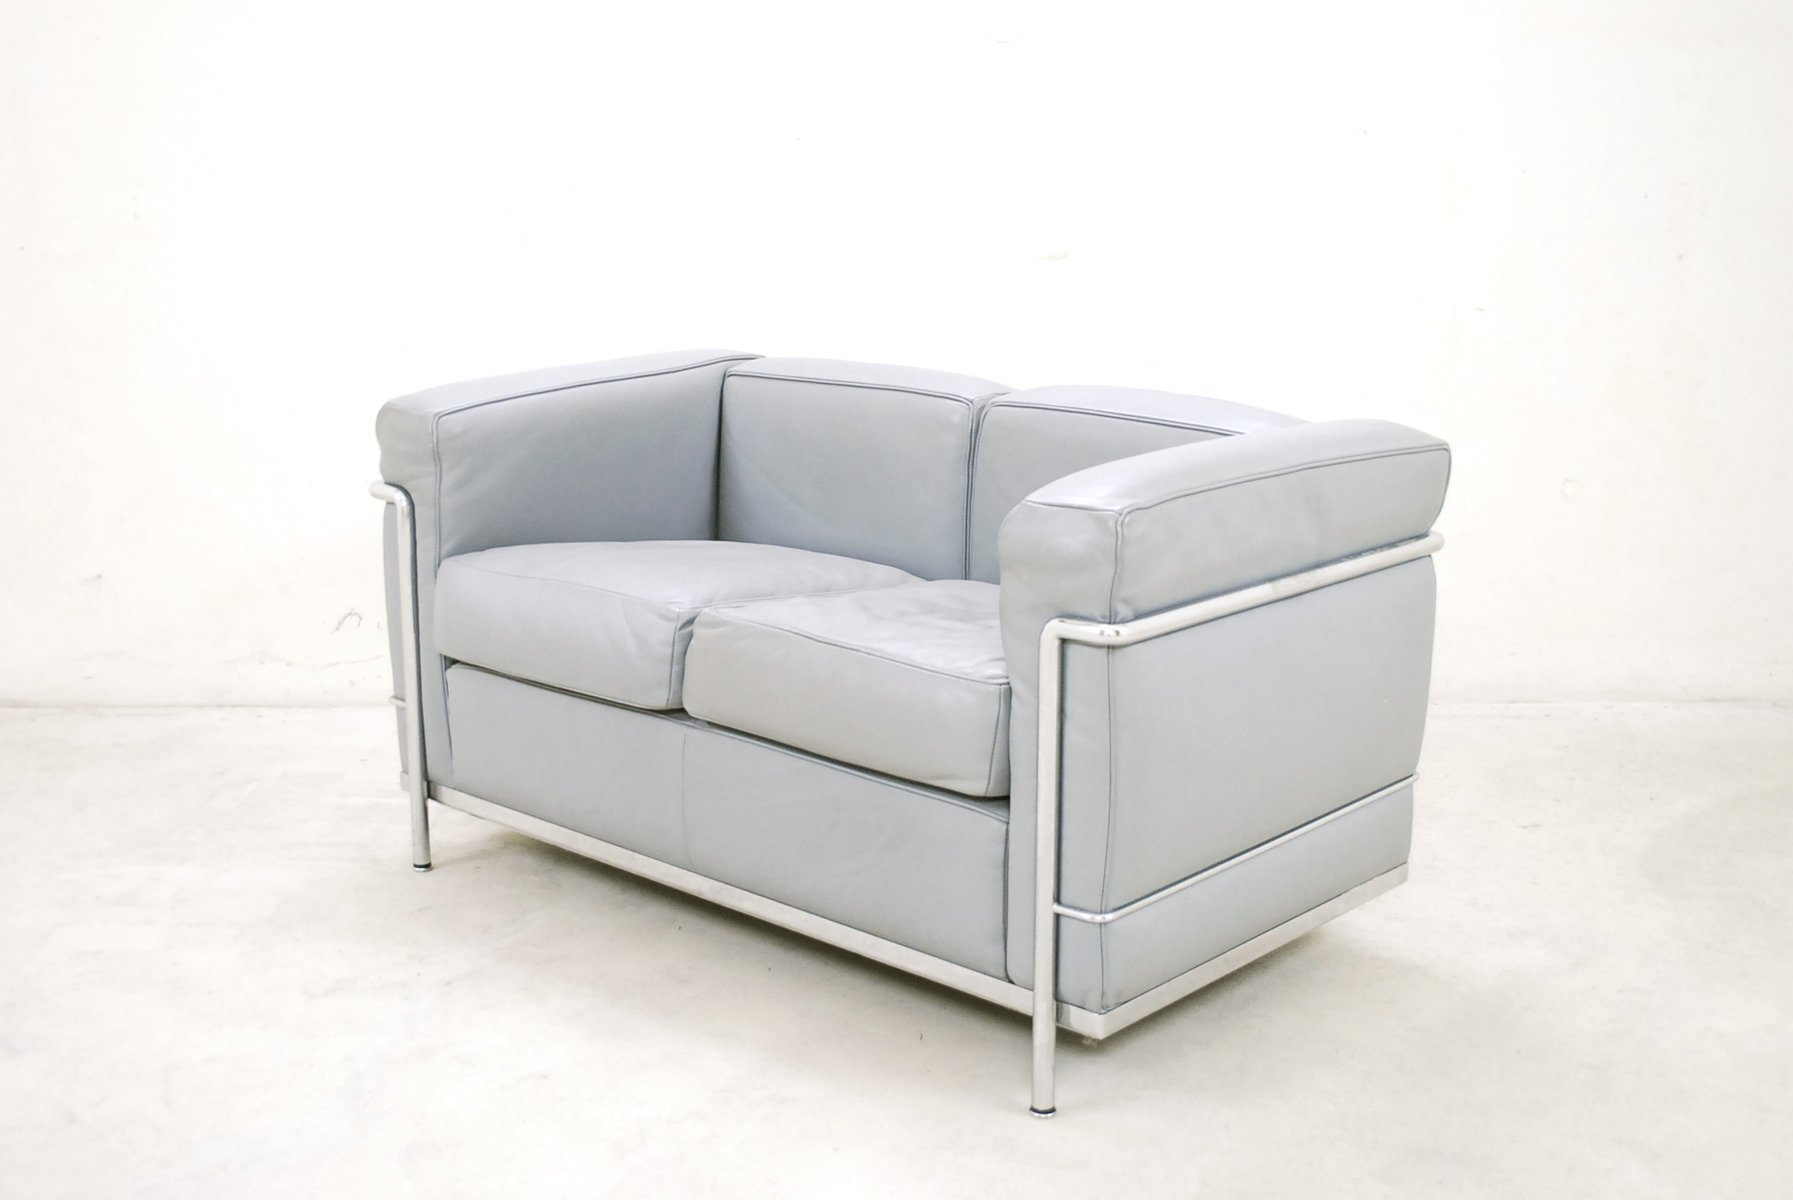 modell lc2 ledersofa von le corbusier f r cassina 1985 bei pamono kaufen. Black Bedroom Furniture Sets. Home Design Ideas